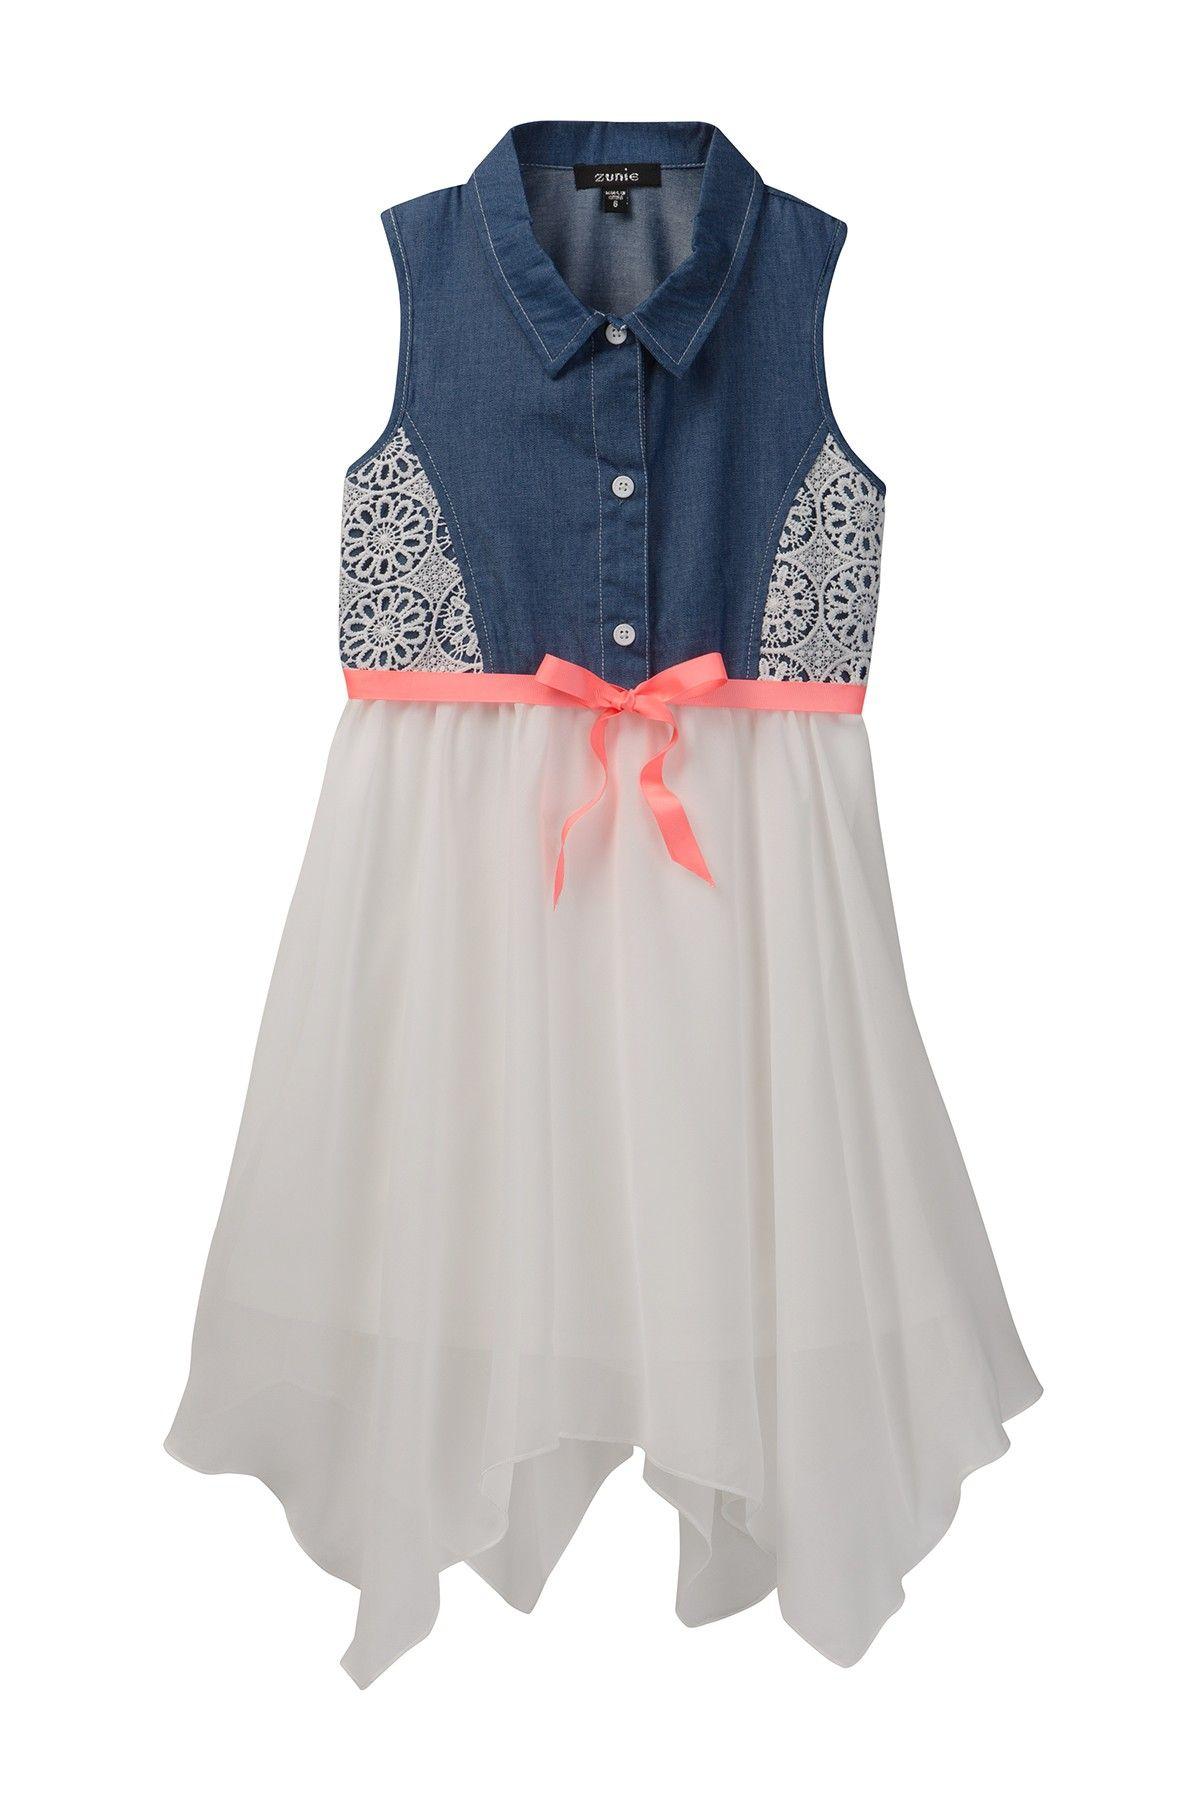 f48547215bbc Zunie | Sleeveles Chambray Lace Dress (Big Girls) | Nordstrom Rack ...